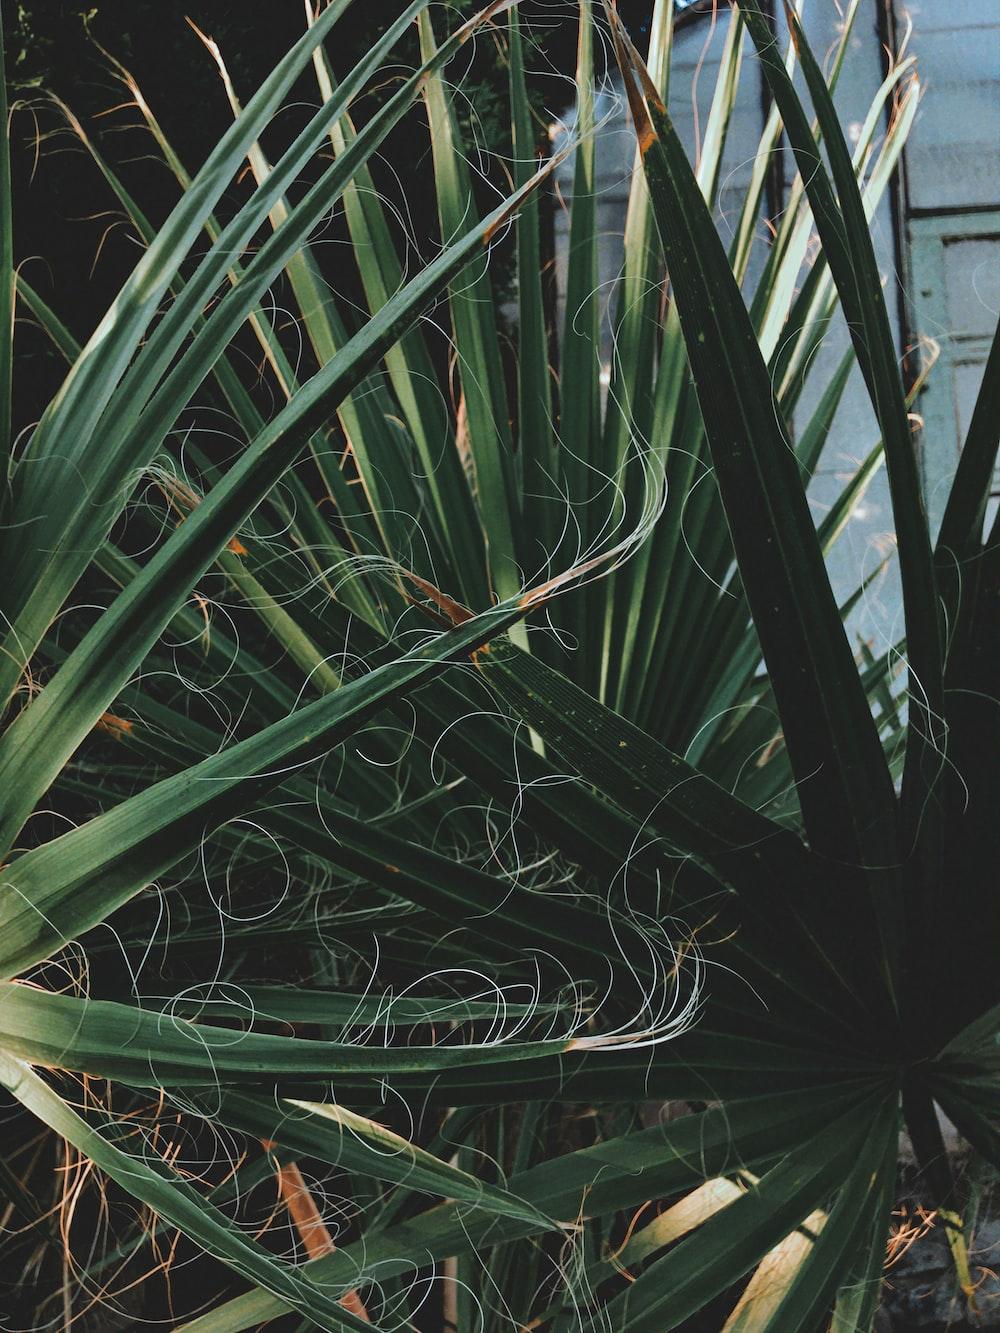 green plant near white metal fence